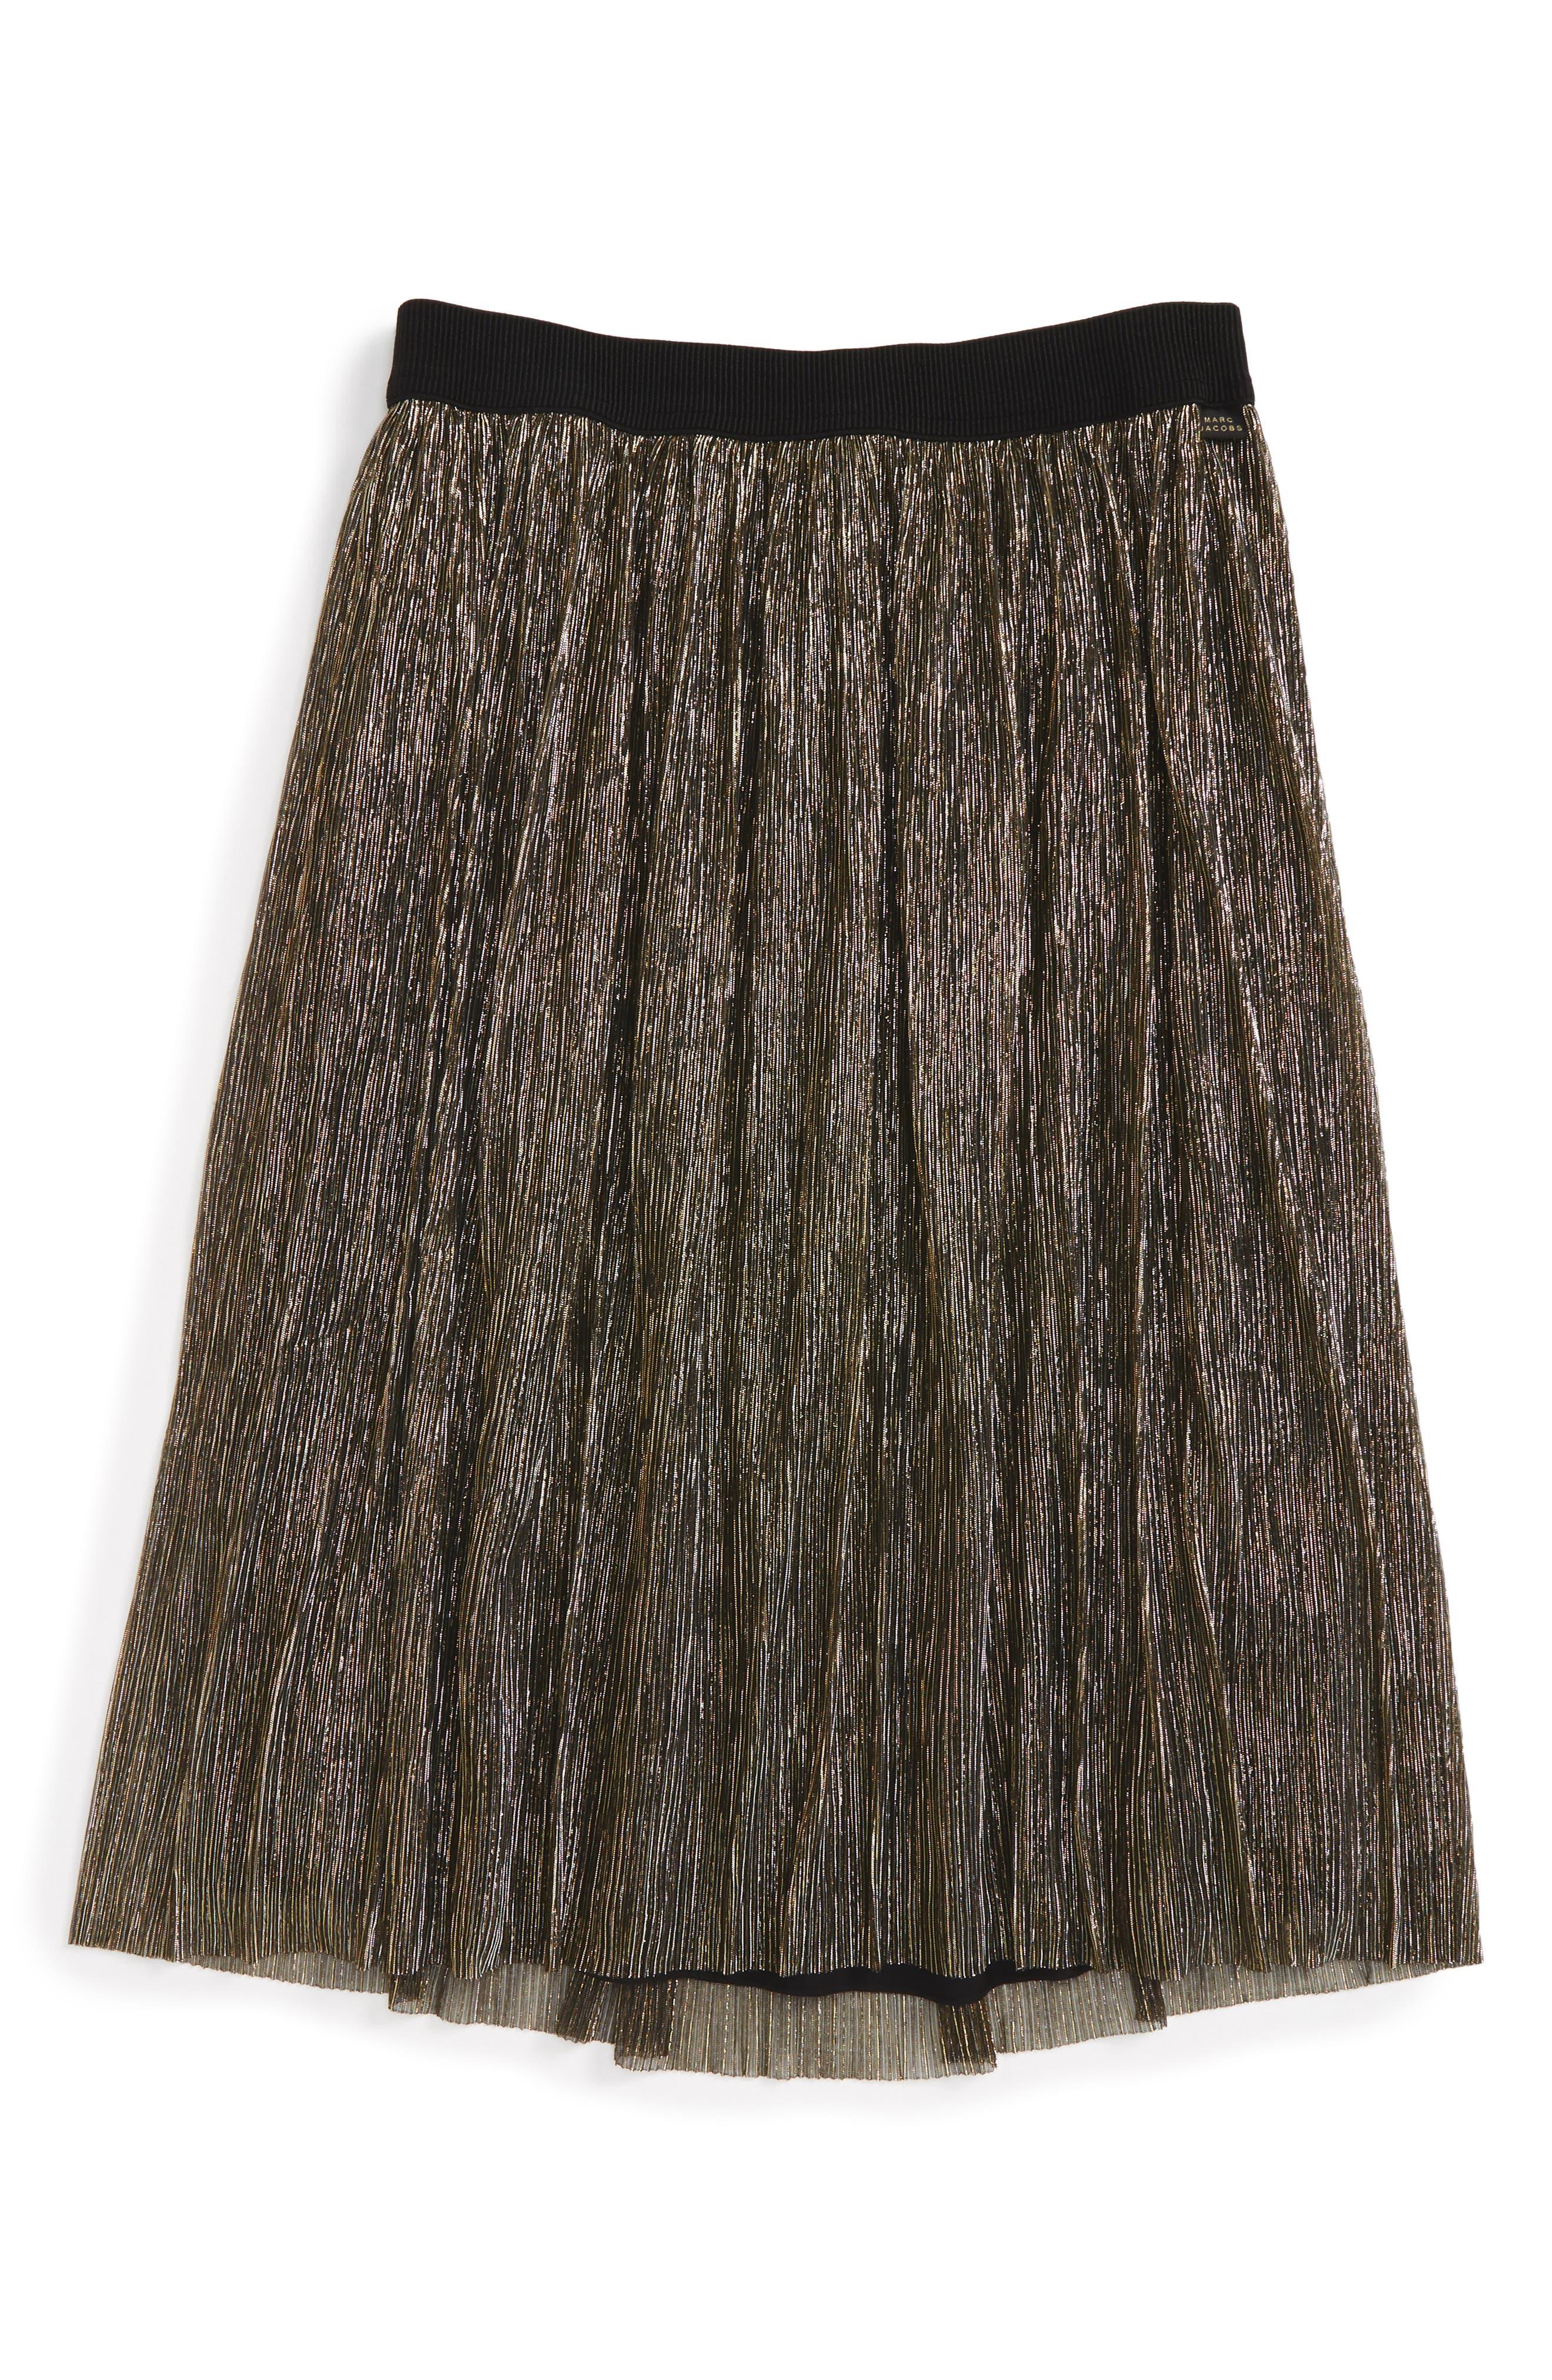 Pleated Metallic Skirt,                             Main thumbnail 1, color,                             Black/ Gold